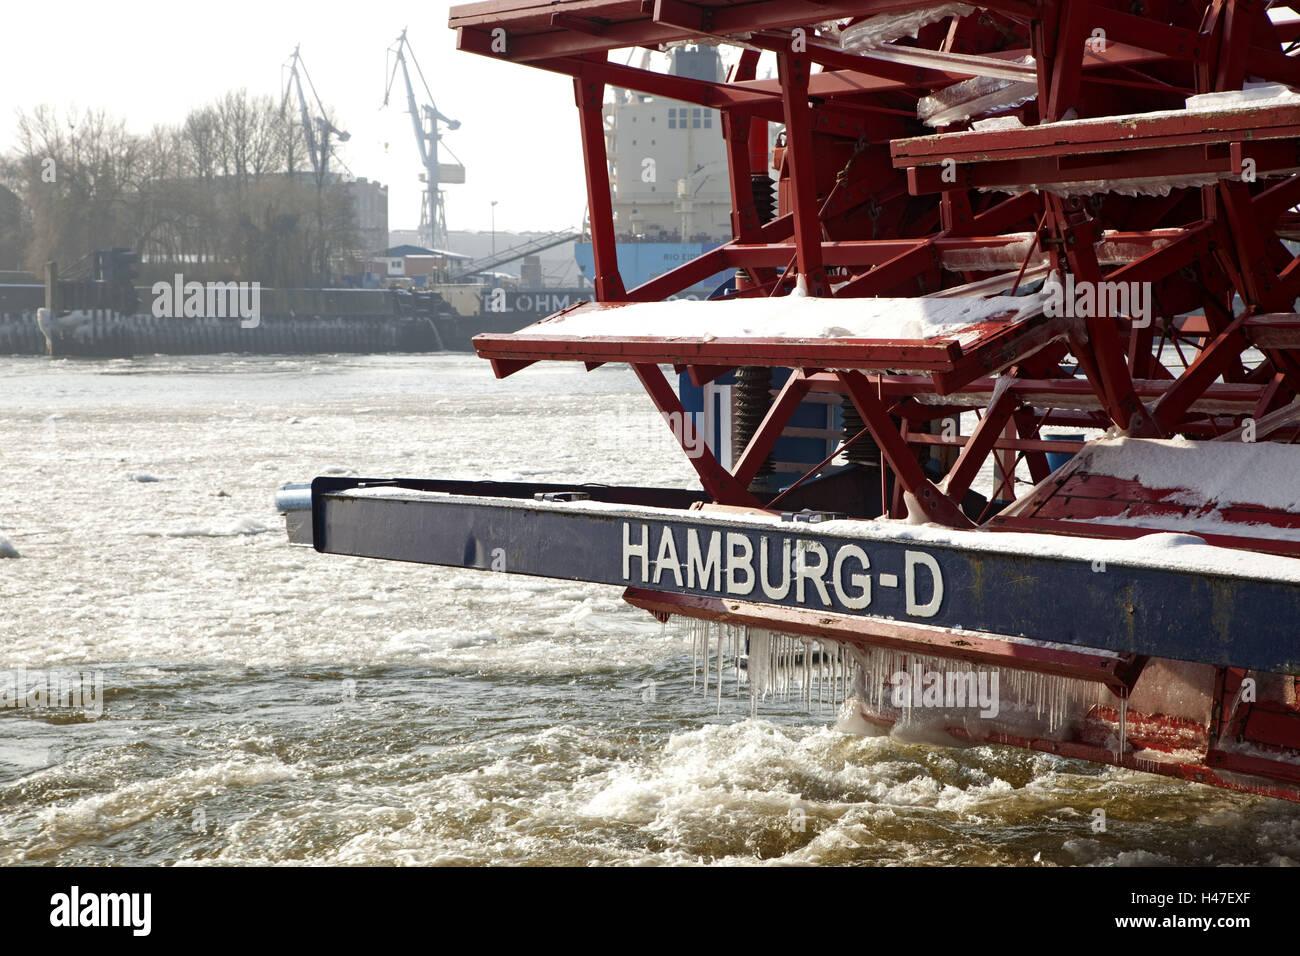 Hamburg, harbour, bucket wheel steamboat, freezes over, detail, winter, - Stock Image